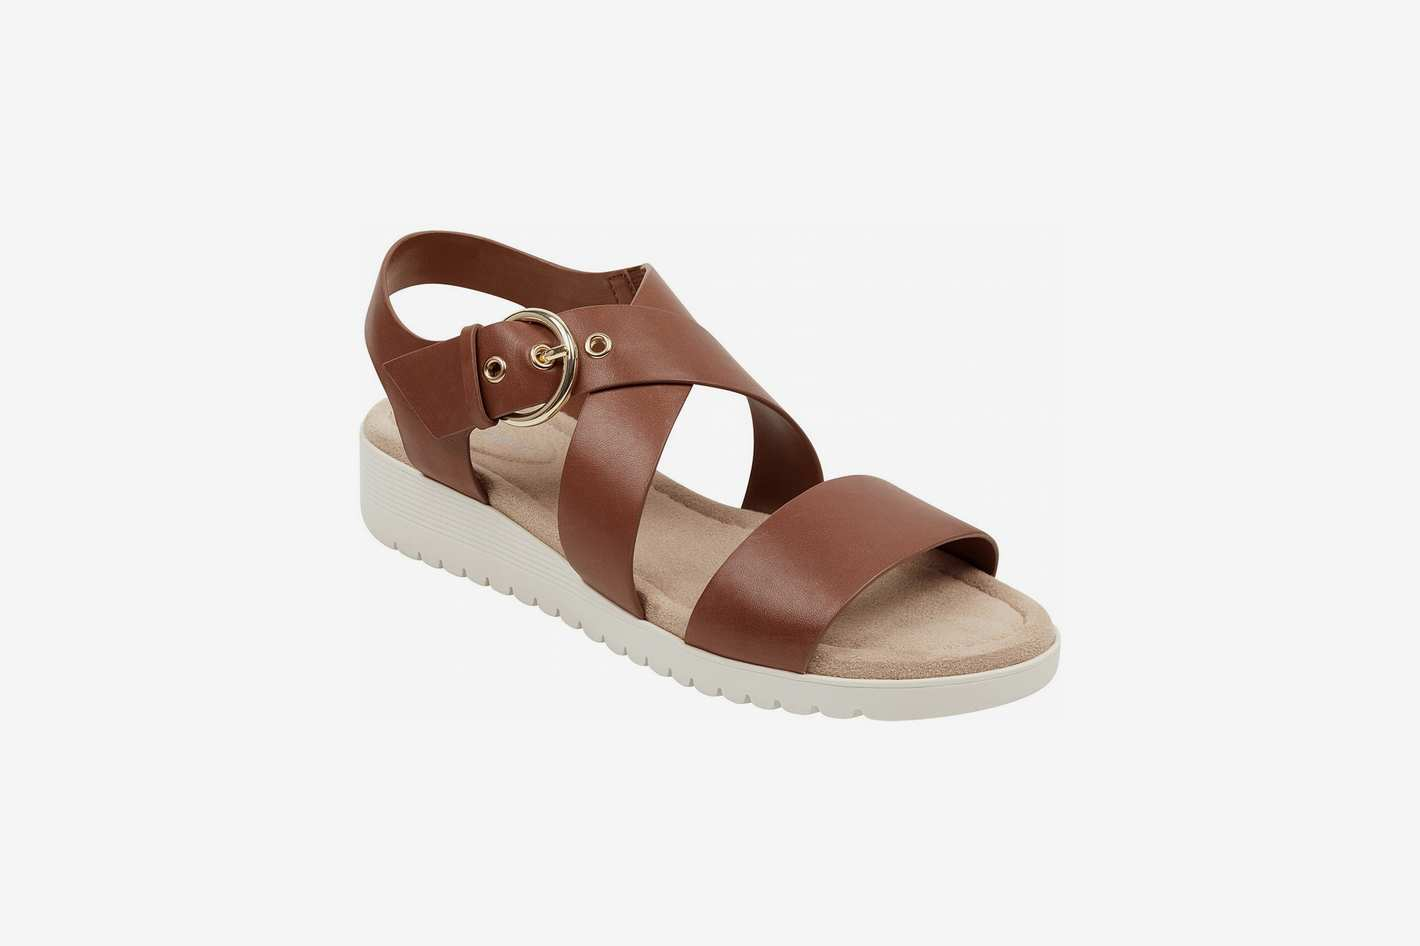 Easy Spirit Helix Flat Sandals